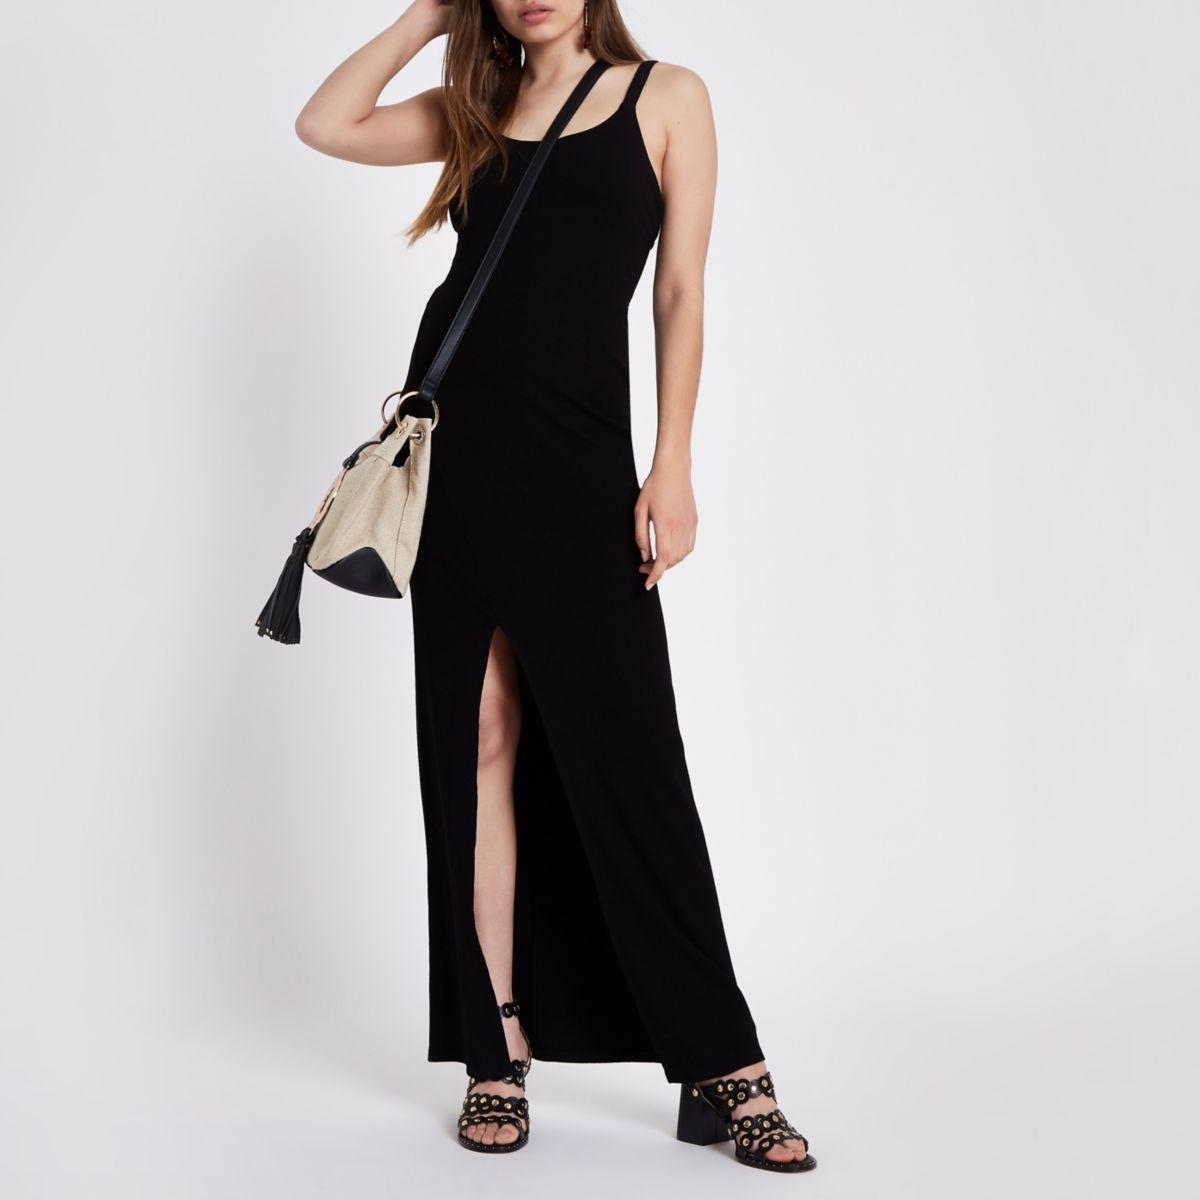 Black ribbed maxi bodycon dress